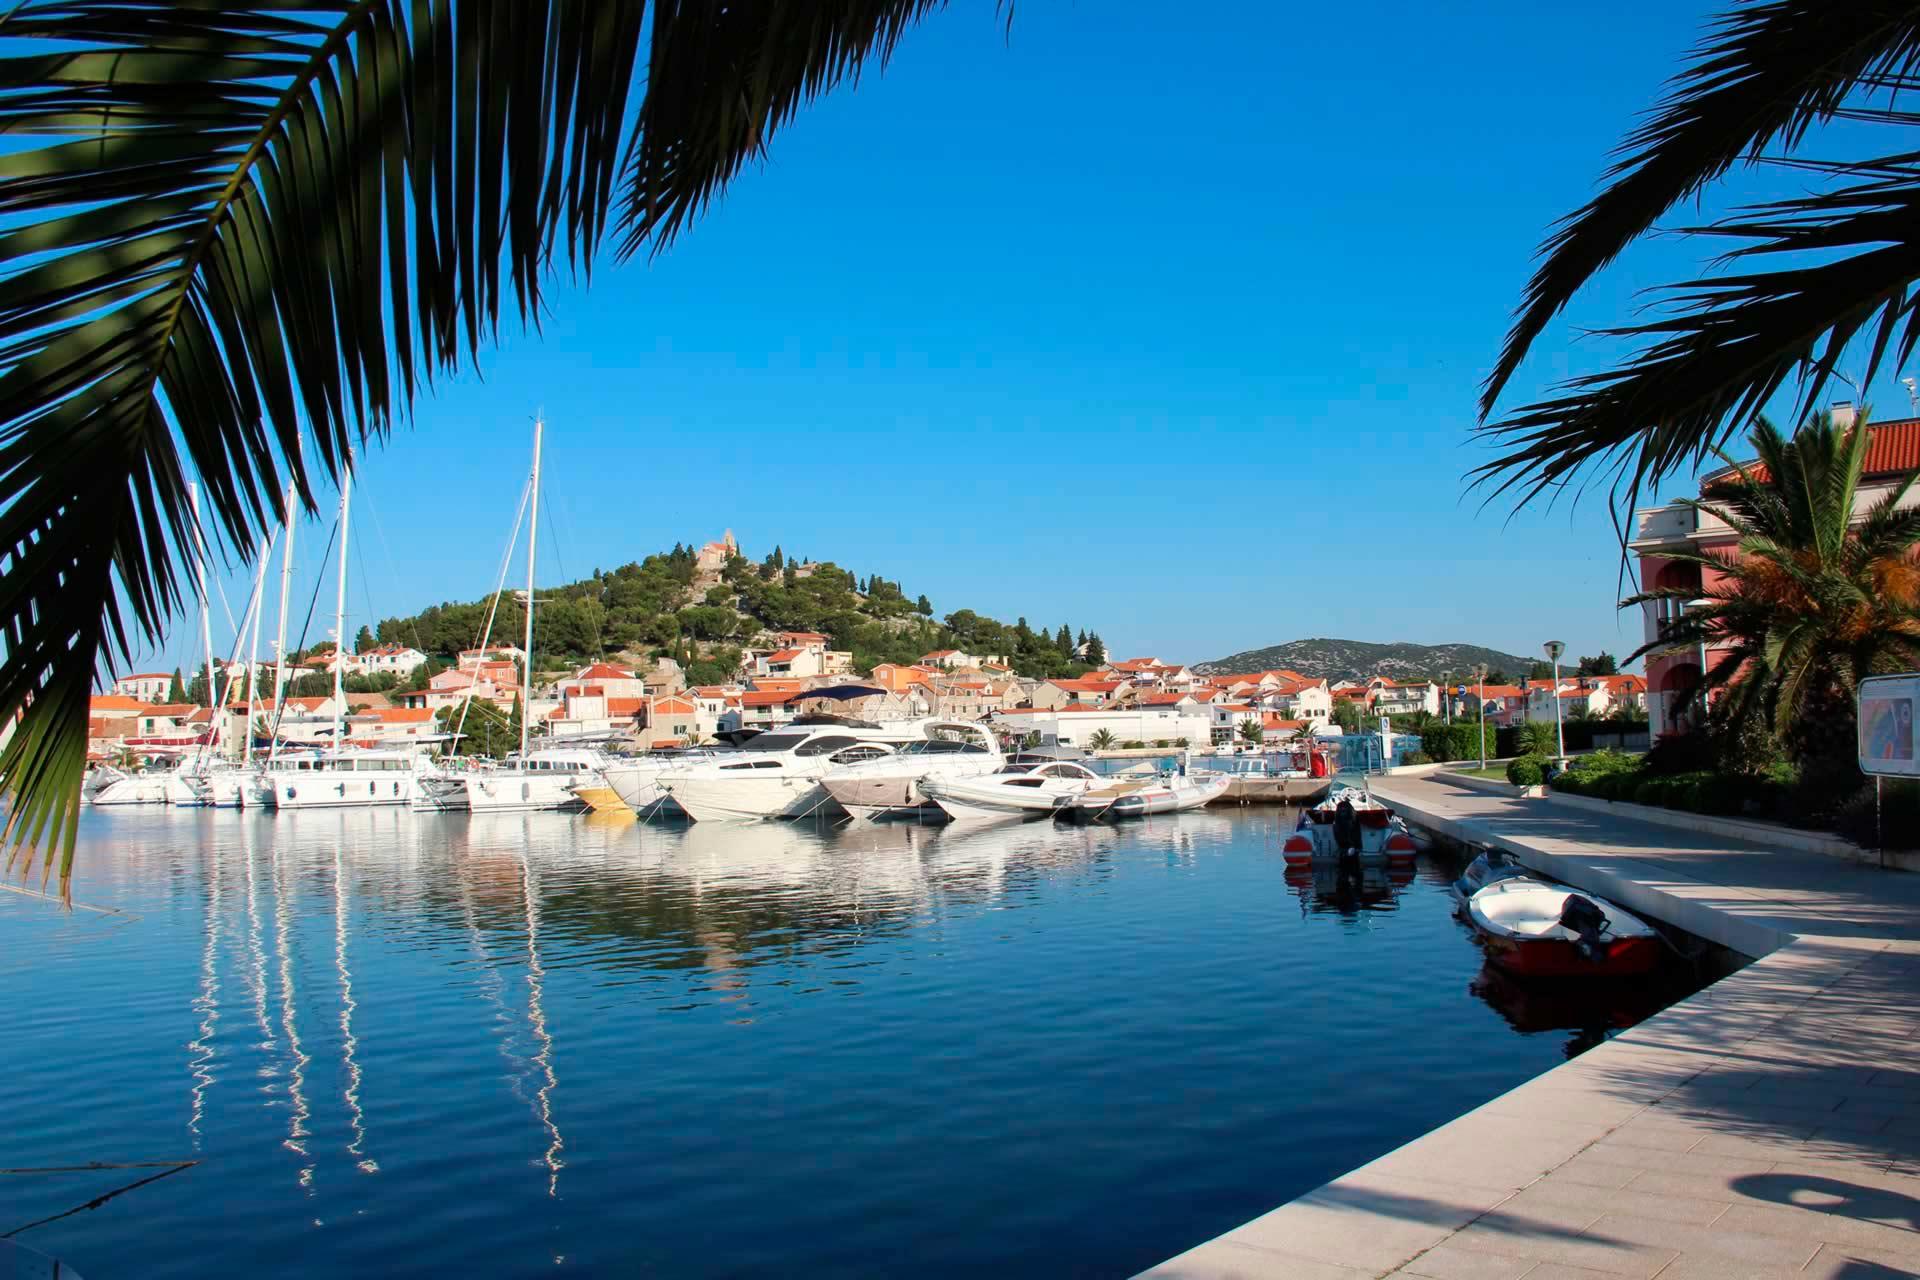 Marinas in Kroatien - Marina Tribunj